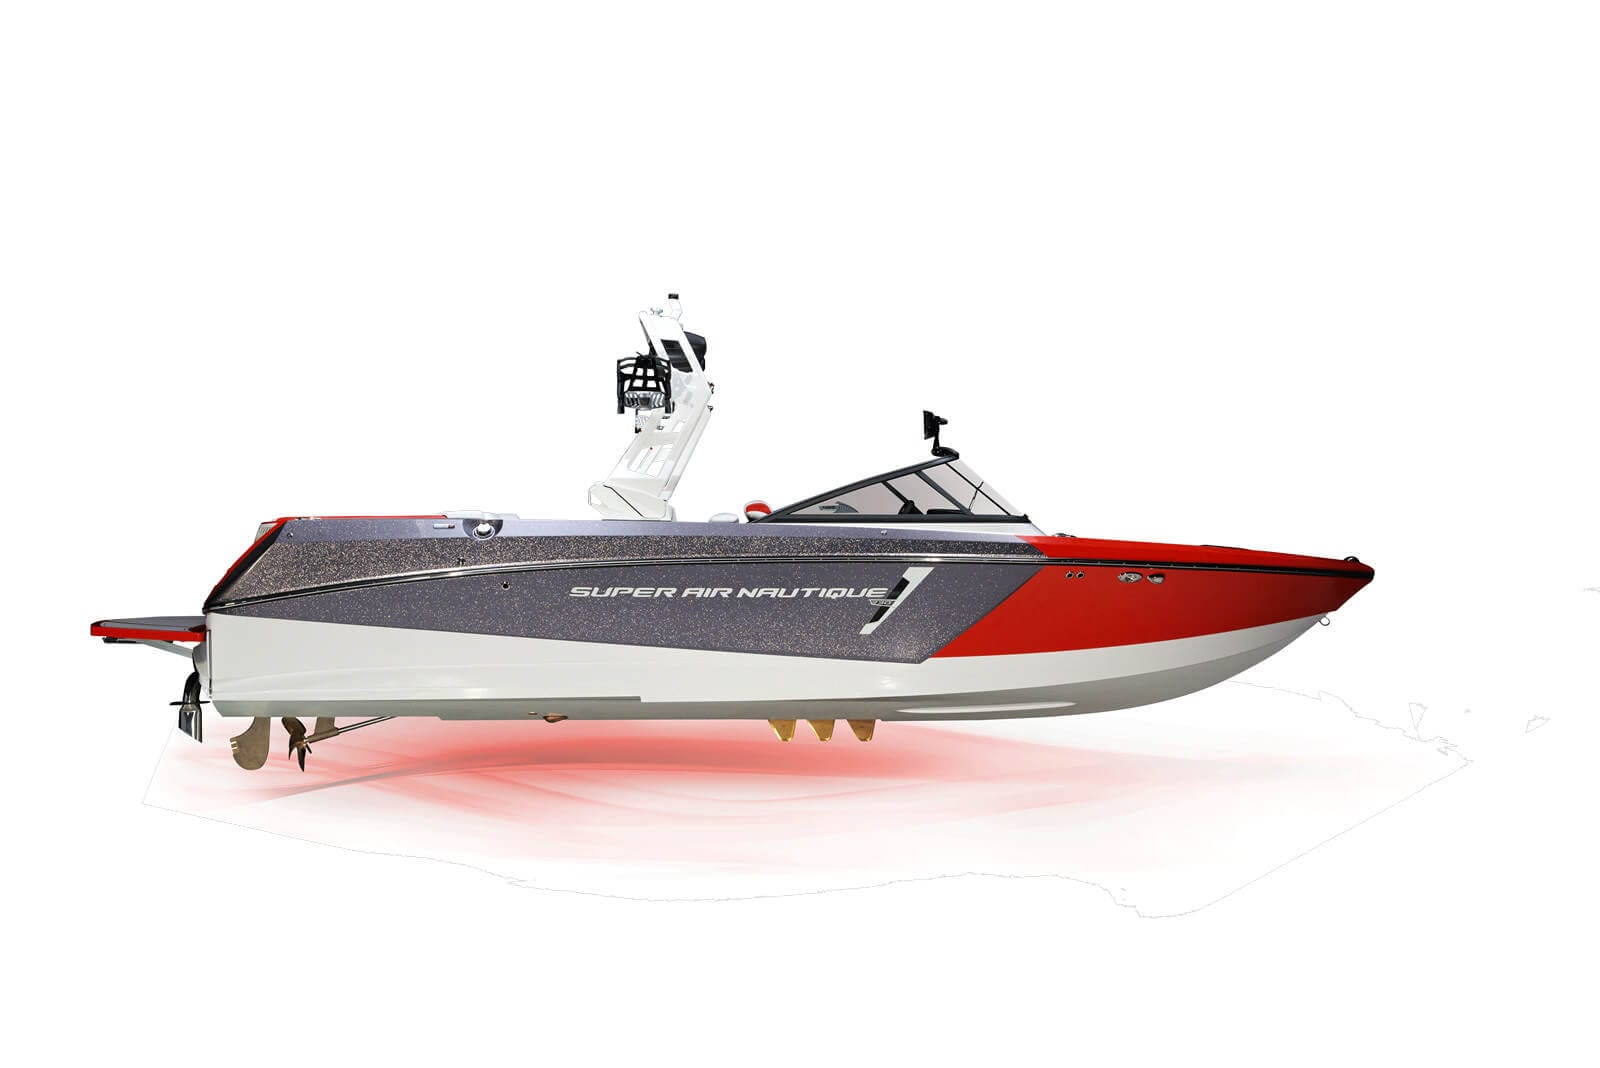 סירת ספורט וויקסרף וויקבורד NAUTIQUE 230 - סטרים יאכטות